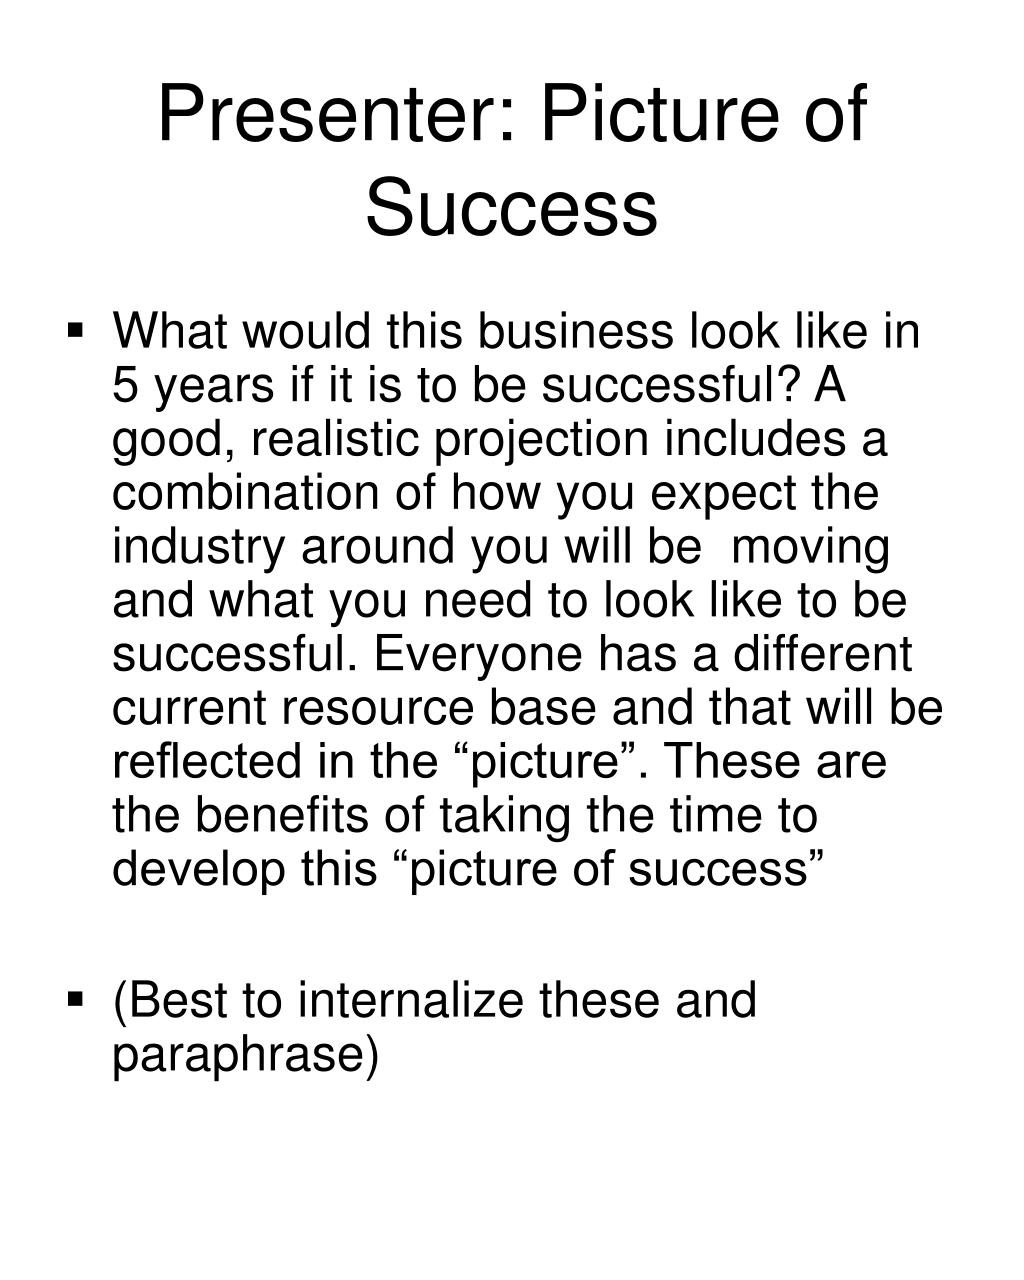 Presenter: Picture of Success